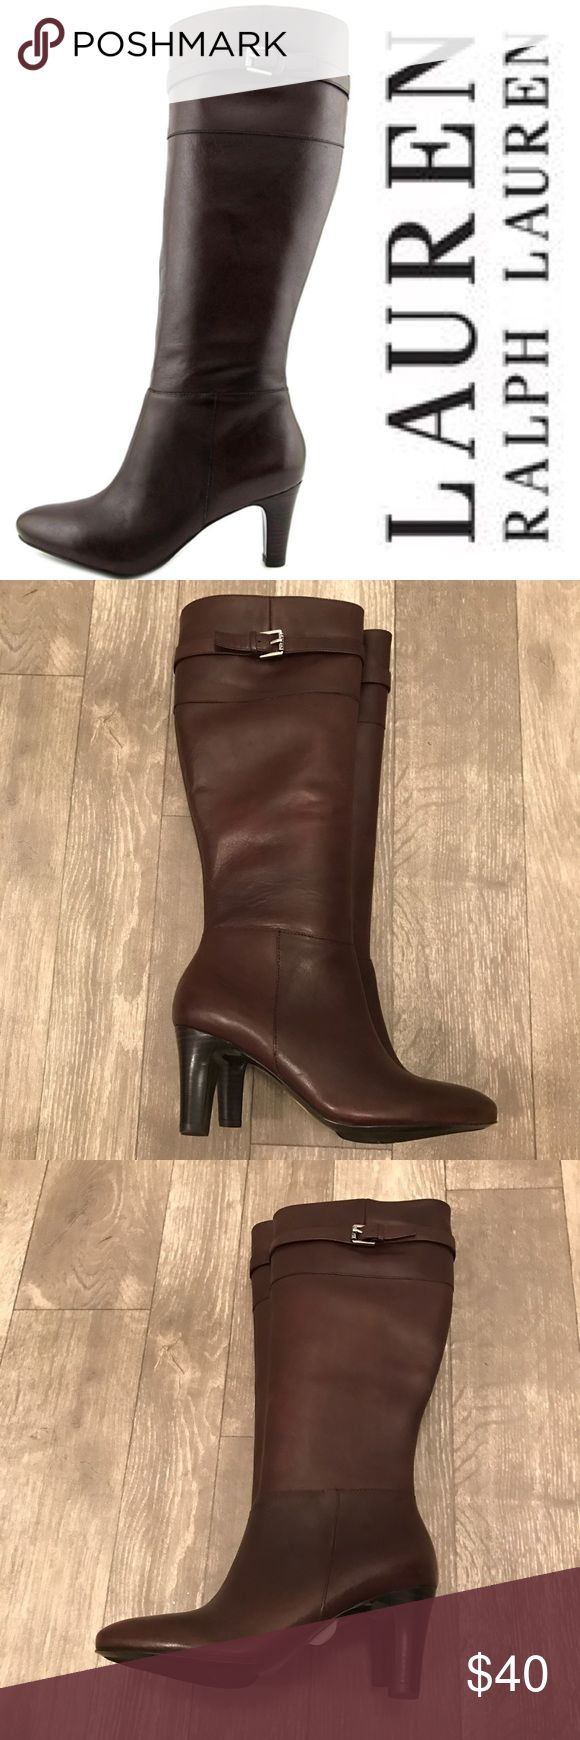 Ralph Lauren Susie Brown Leather Knee High Boot Brand new without box! Size 5. Lauren Ralph Lauren Shoes Heeled Boots